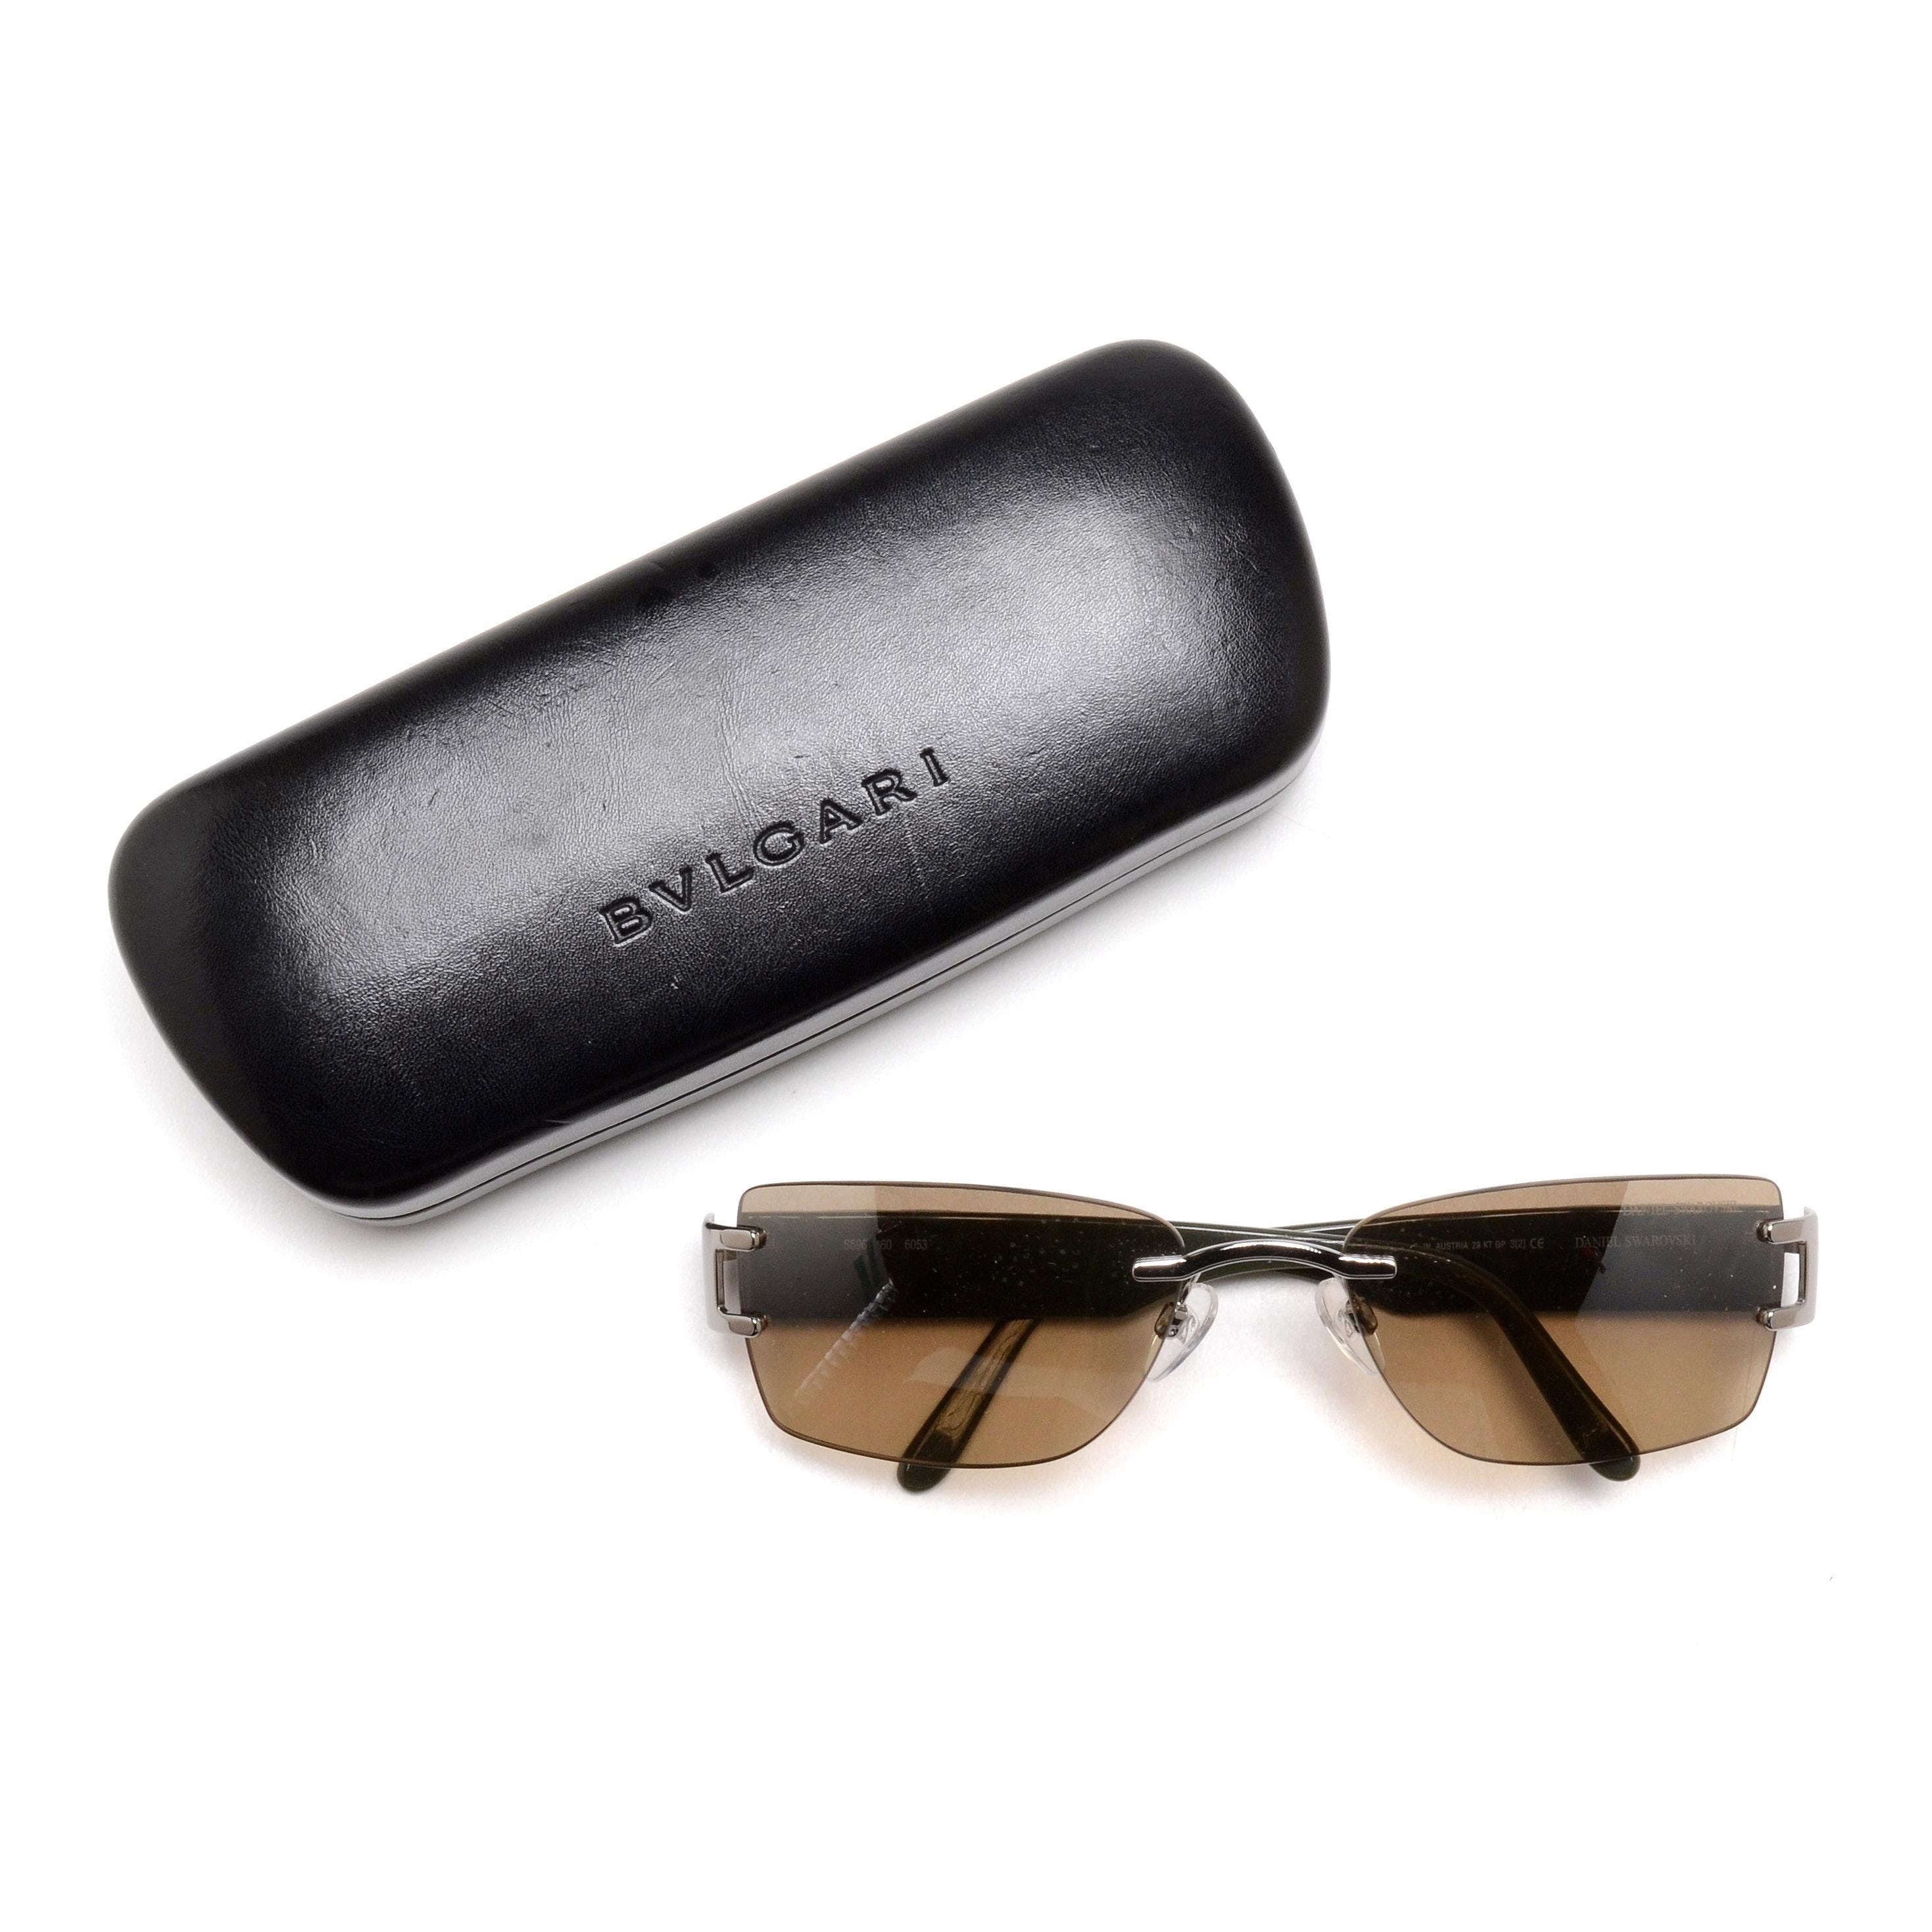 Daniel Swarovski Women's Sunglasses